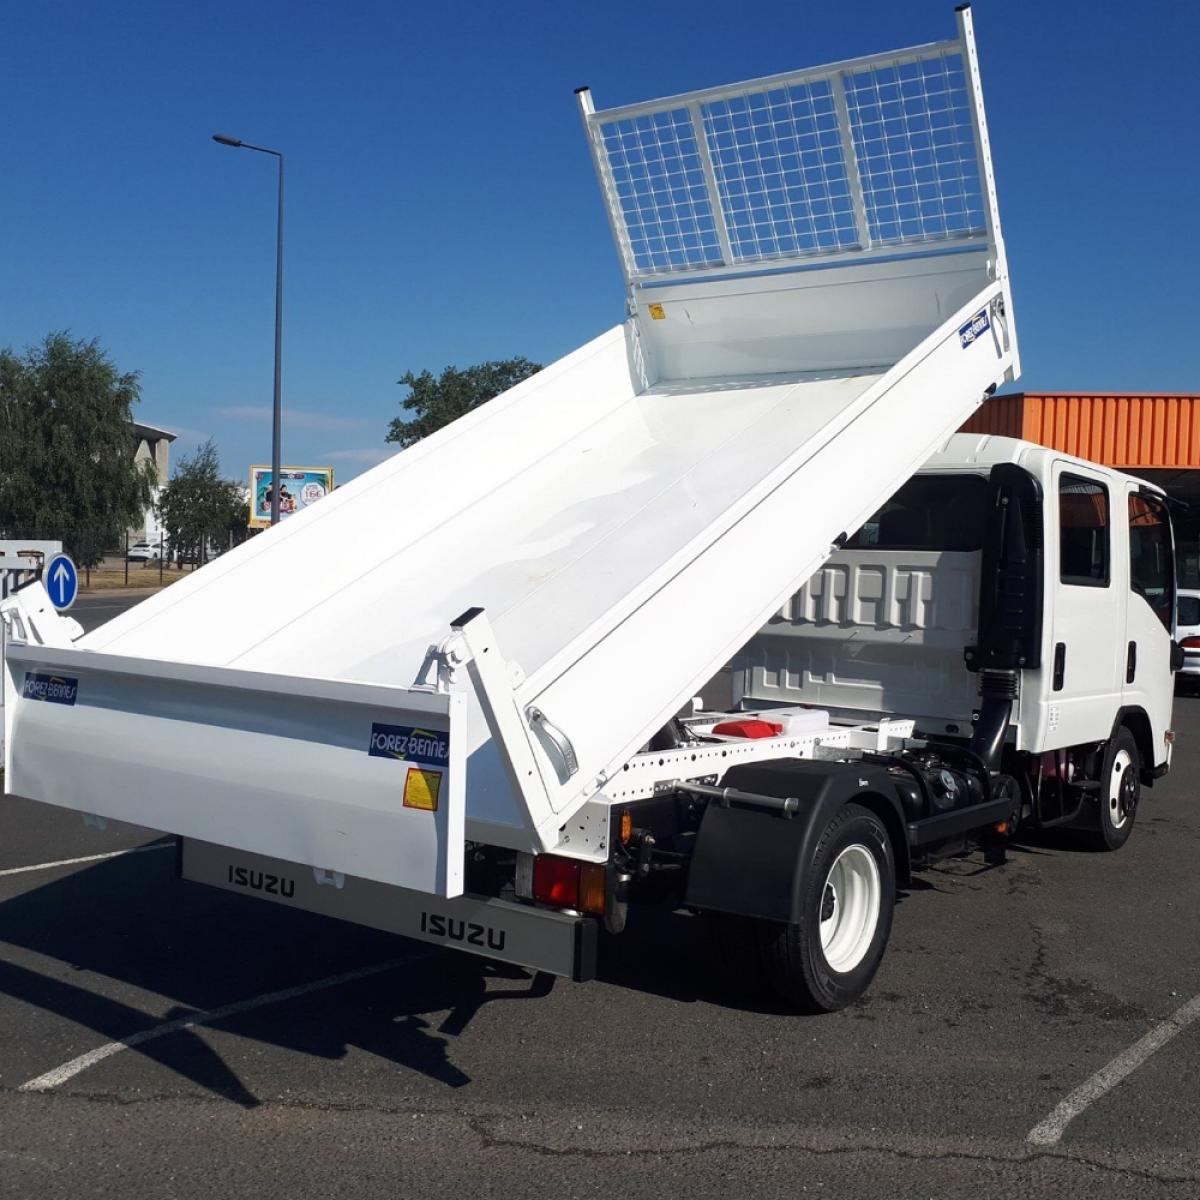 Isuzu M21 Double Cab Usabilita